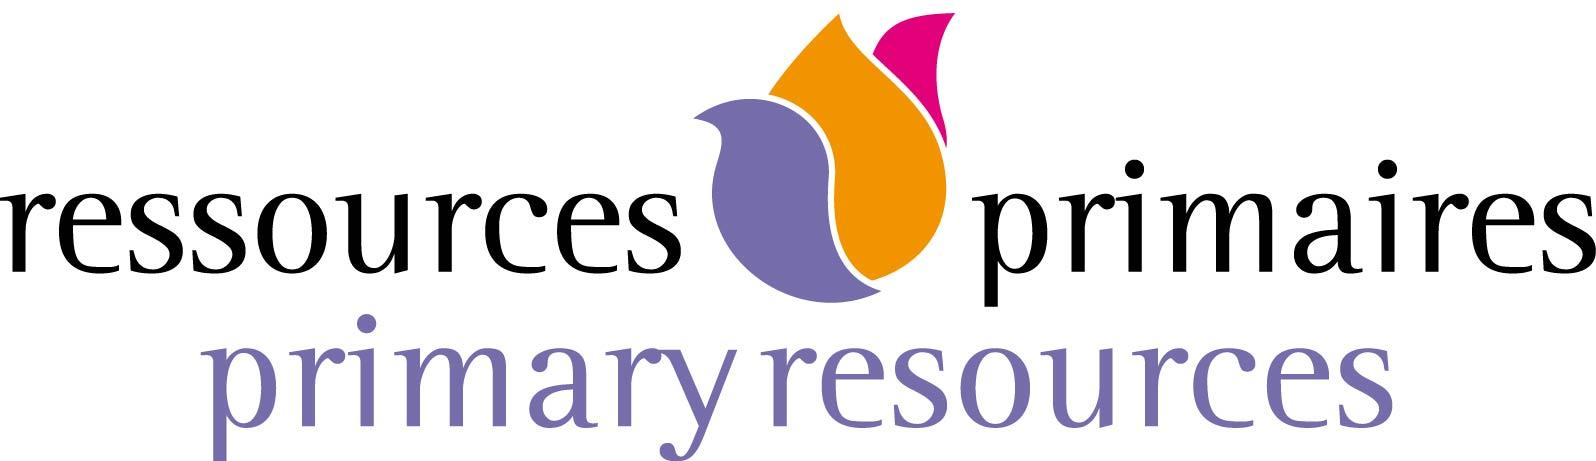 Ressources Primaires | Primary Resources